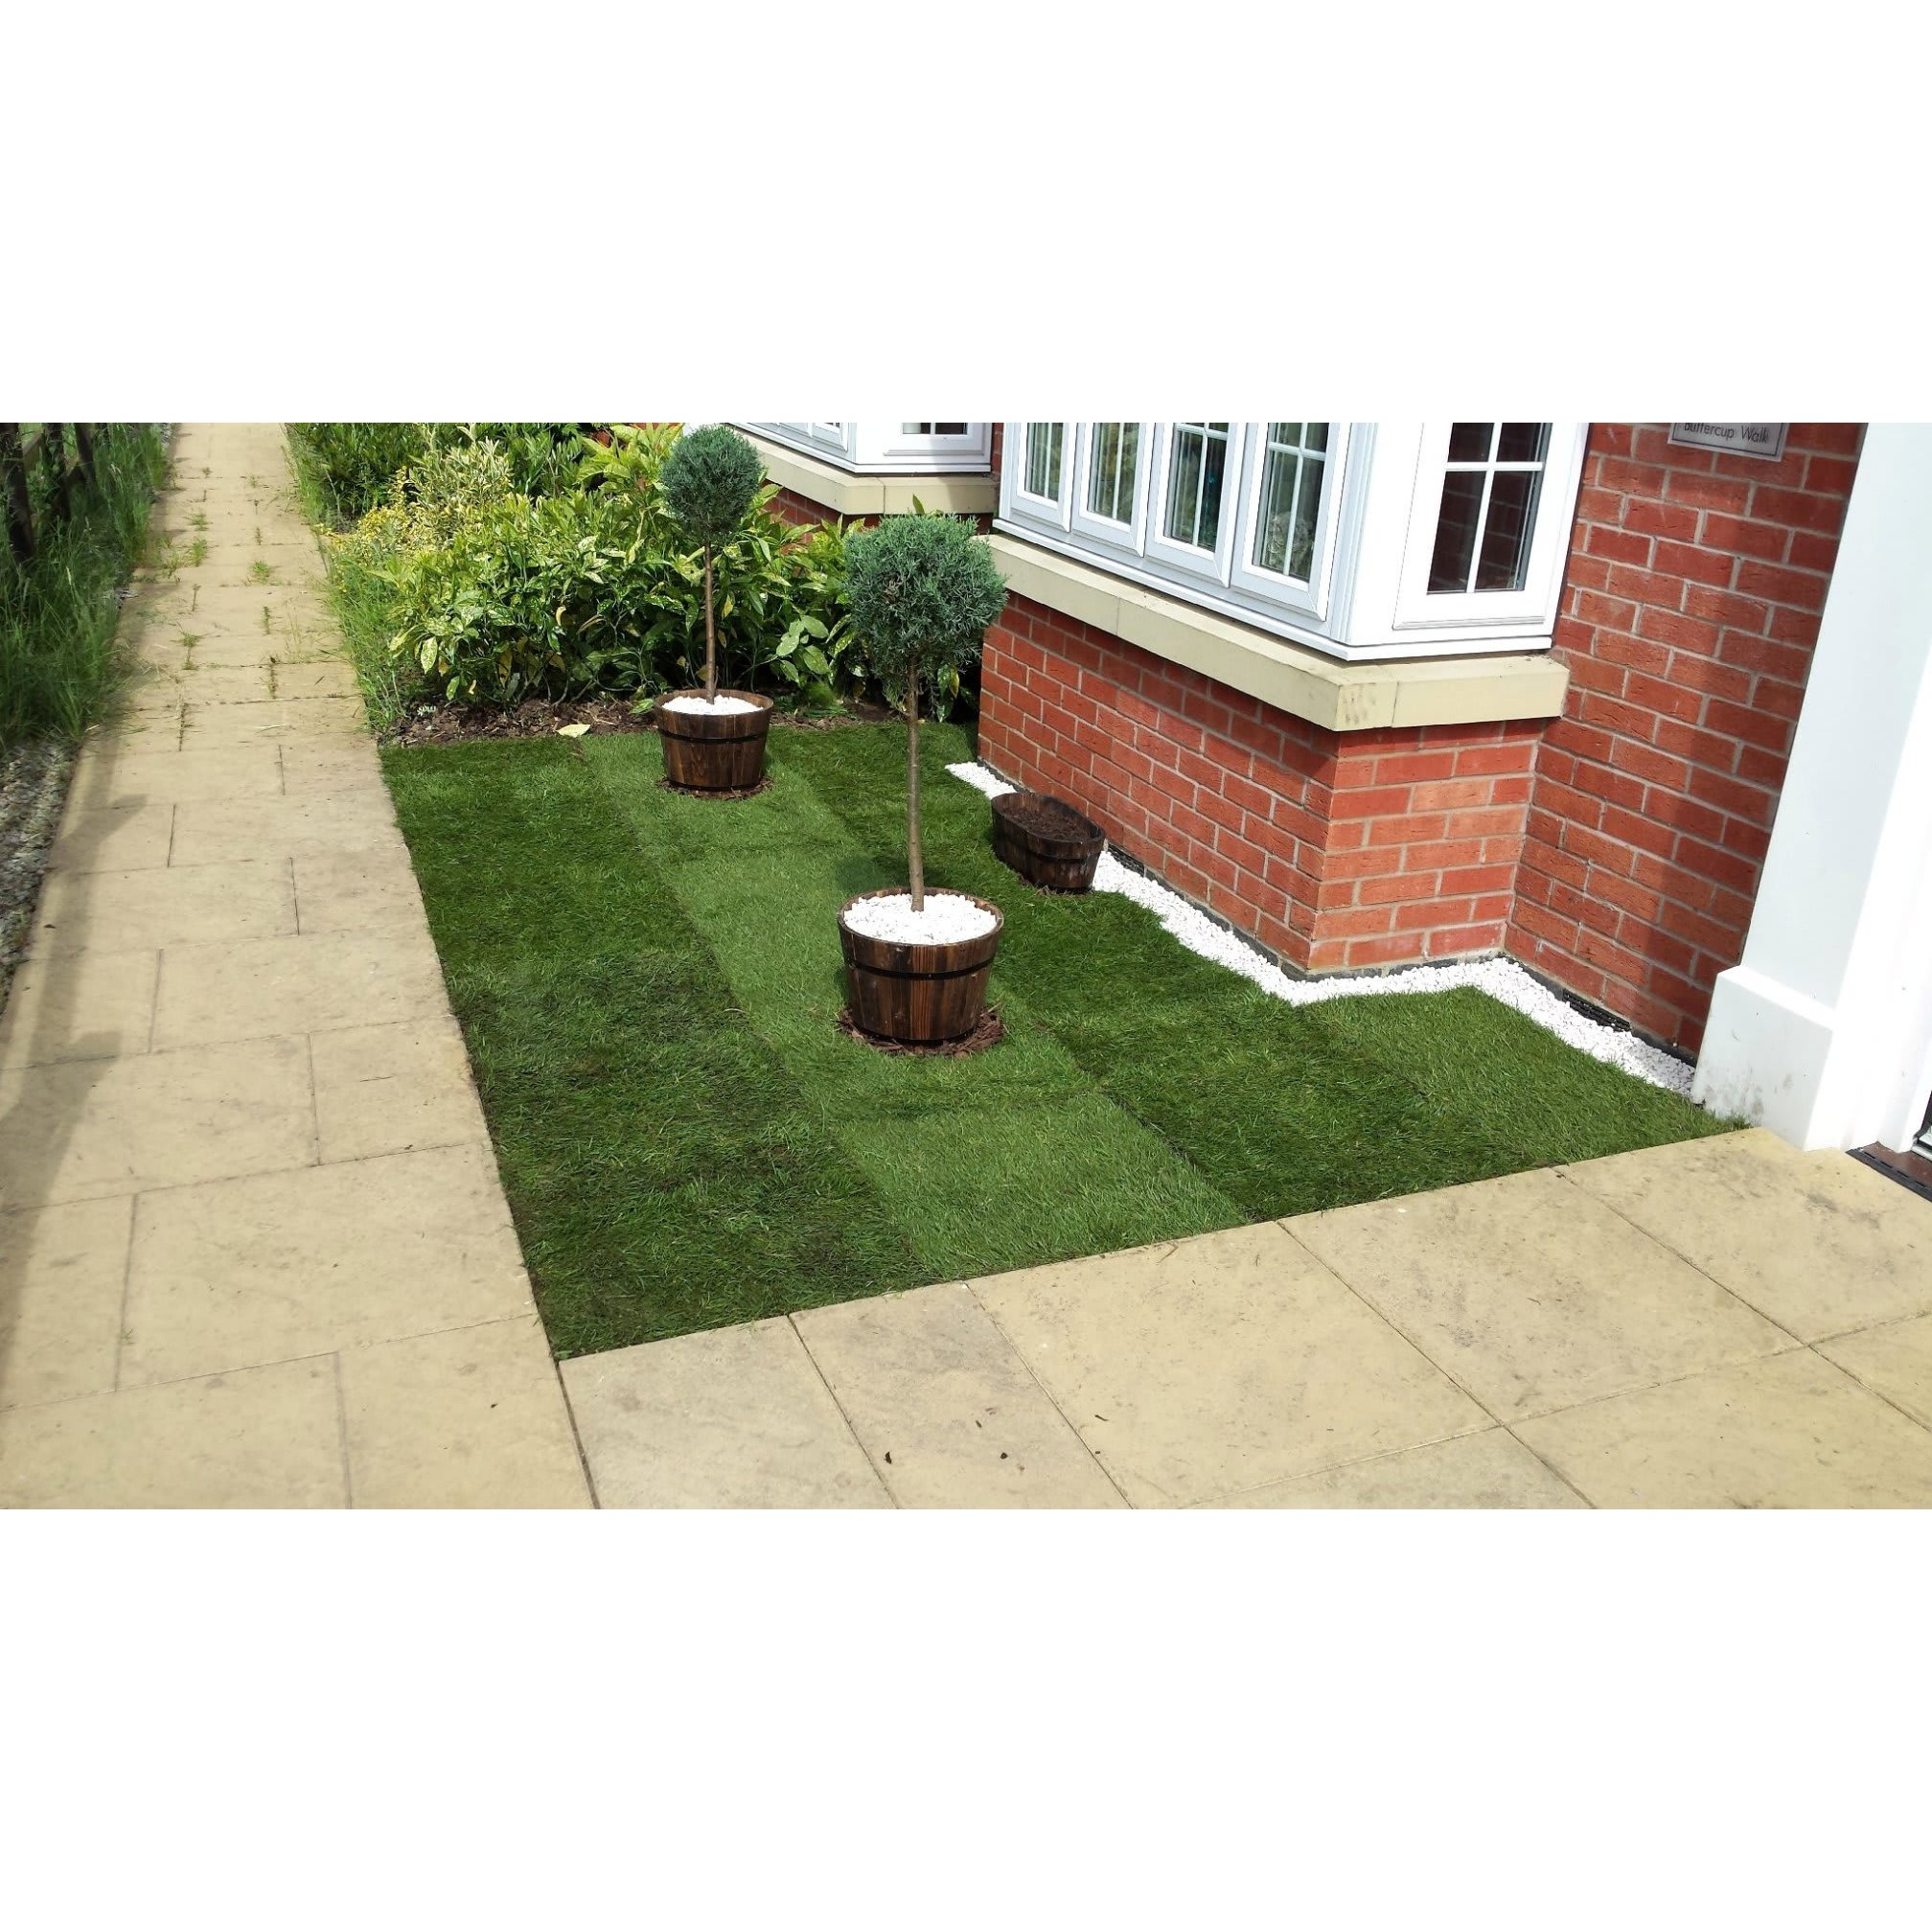 De-Fence Landscaping Ltd - Northampton, Northamptonshire NN3 6NN - 07850 667672 | ShowMeLocal.com